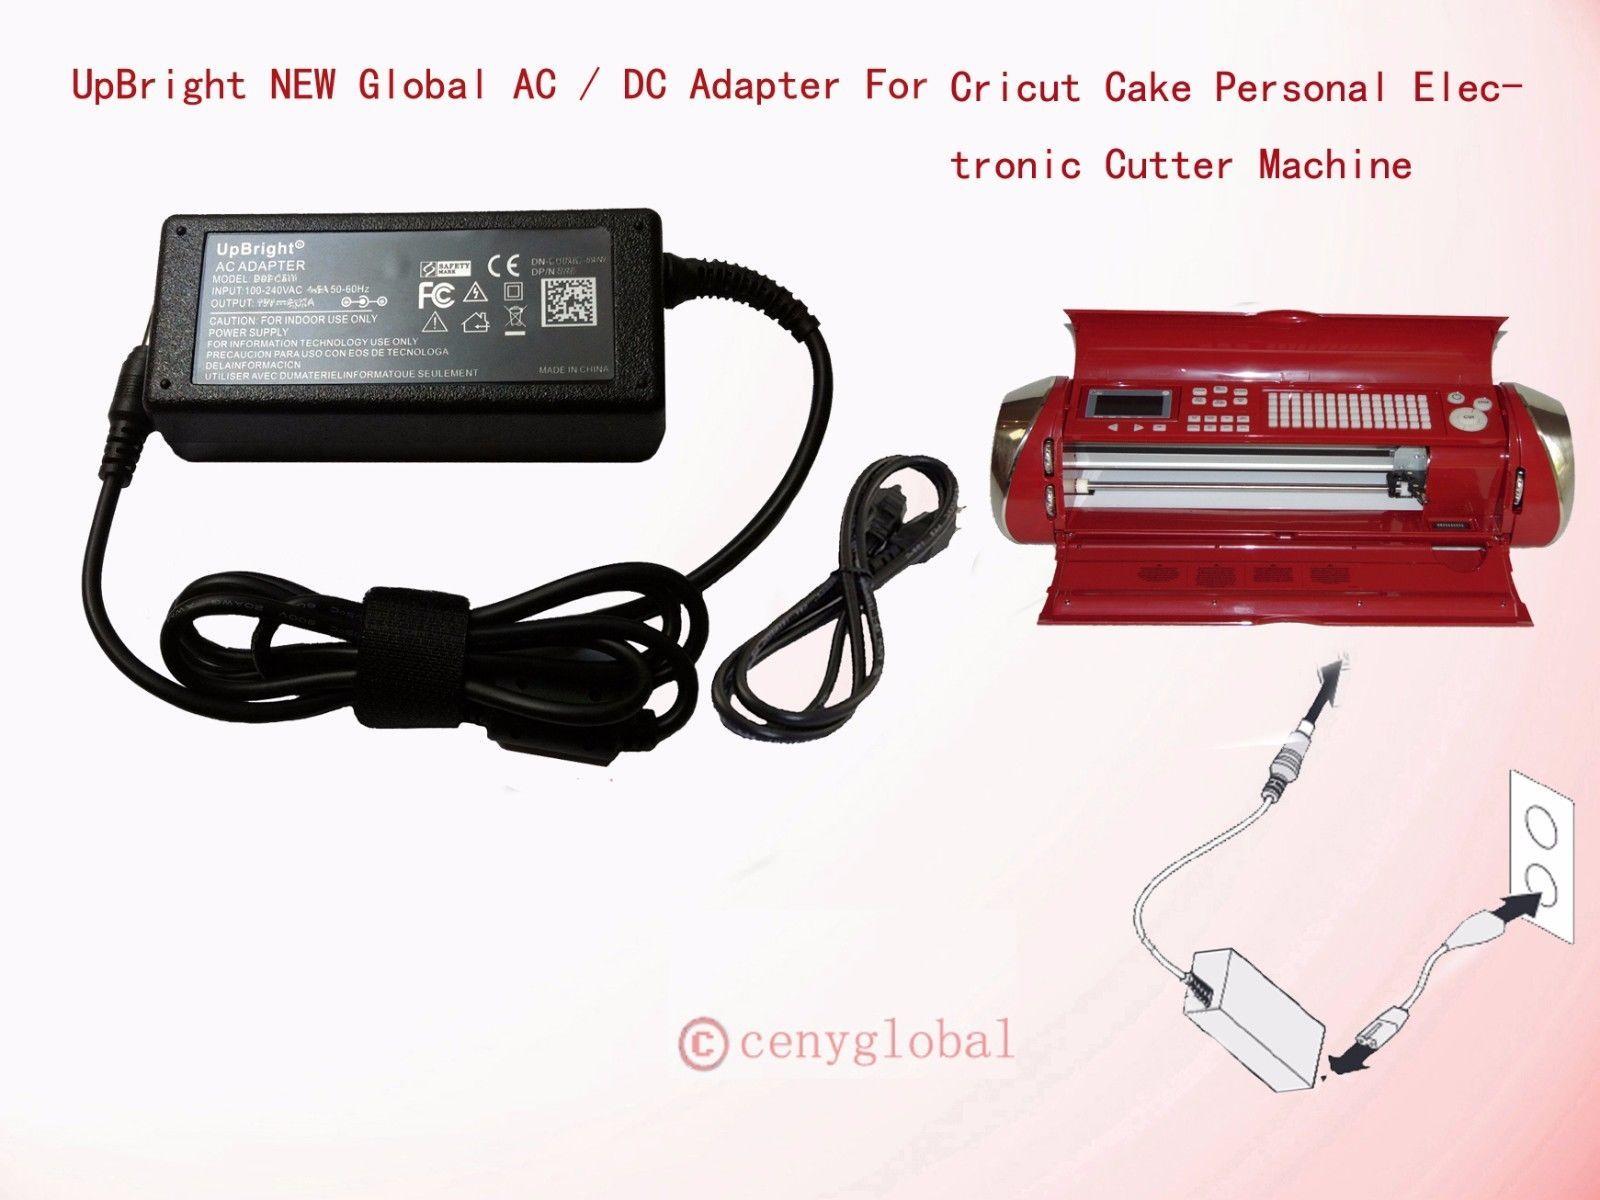 AC Adapter Power Cord 4 Cricut Cutting Personal Cake Create Expression Machine